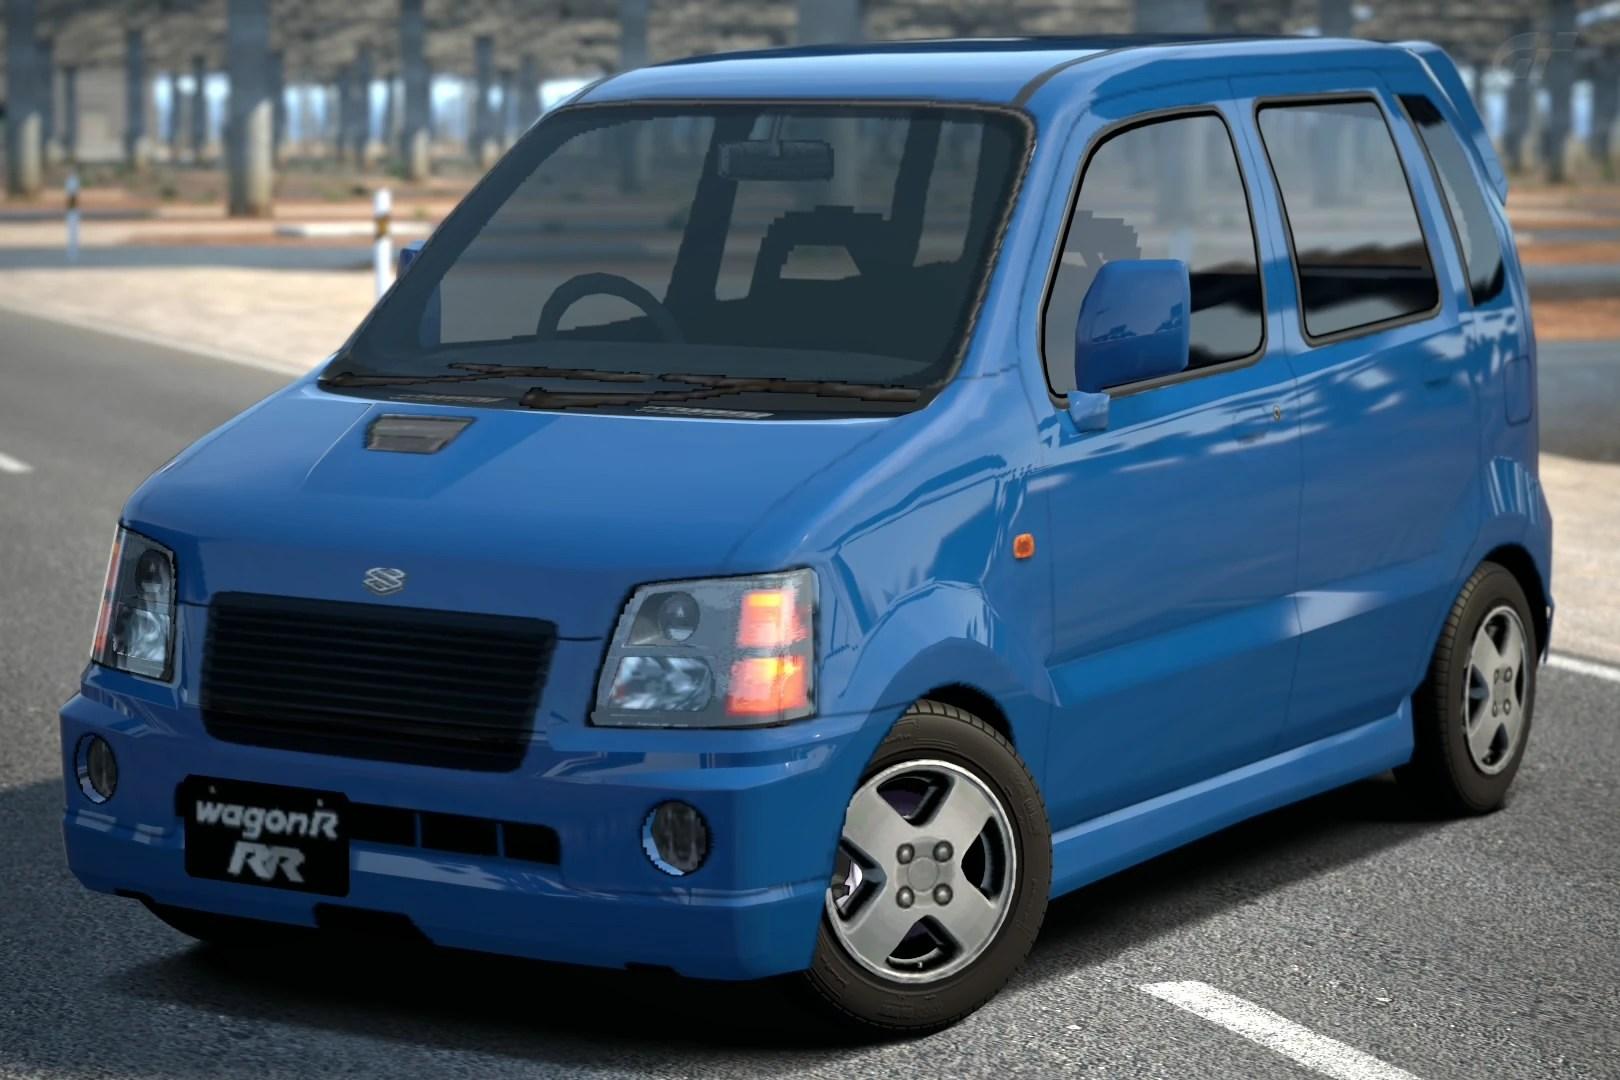 small resolution of suzuki wagon r rr 98